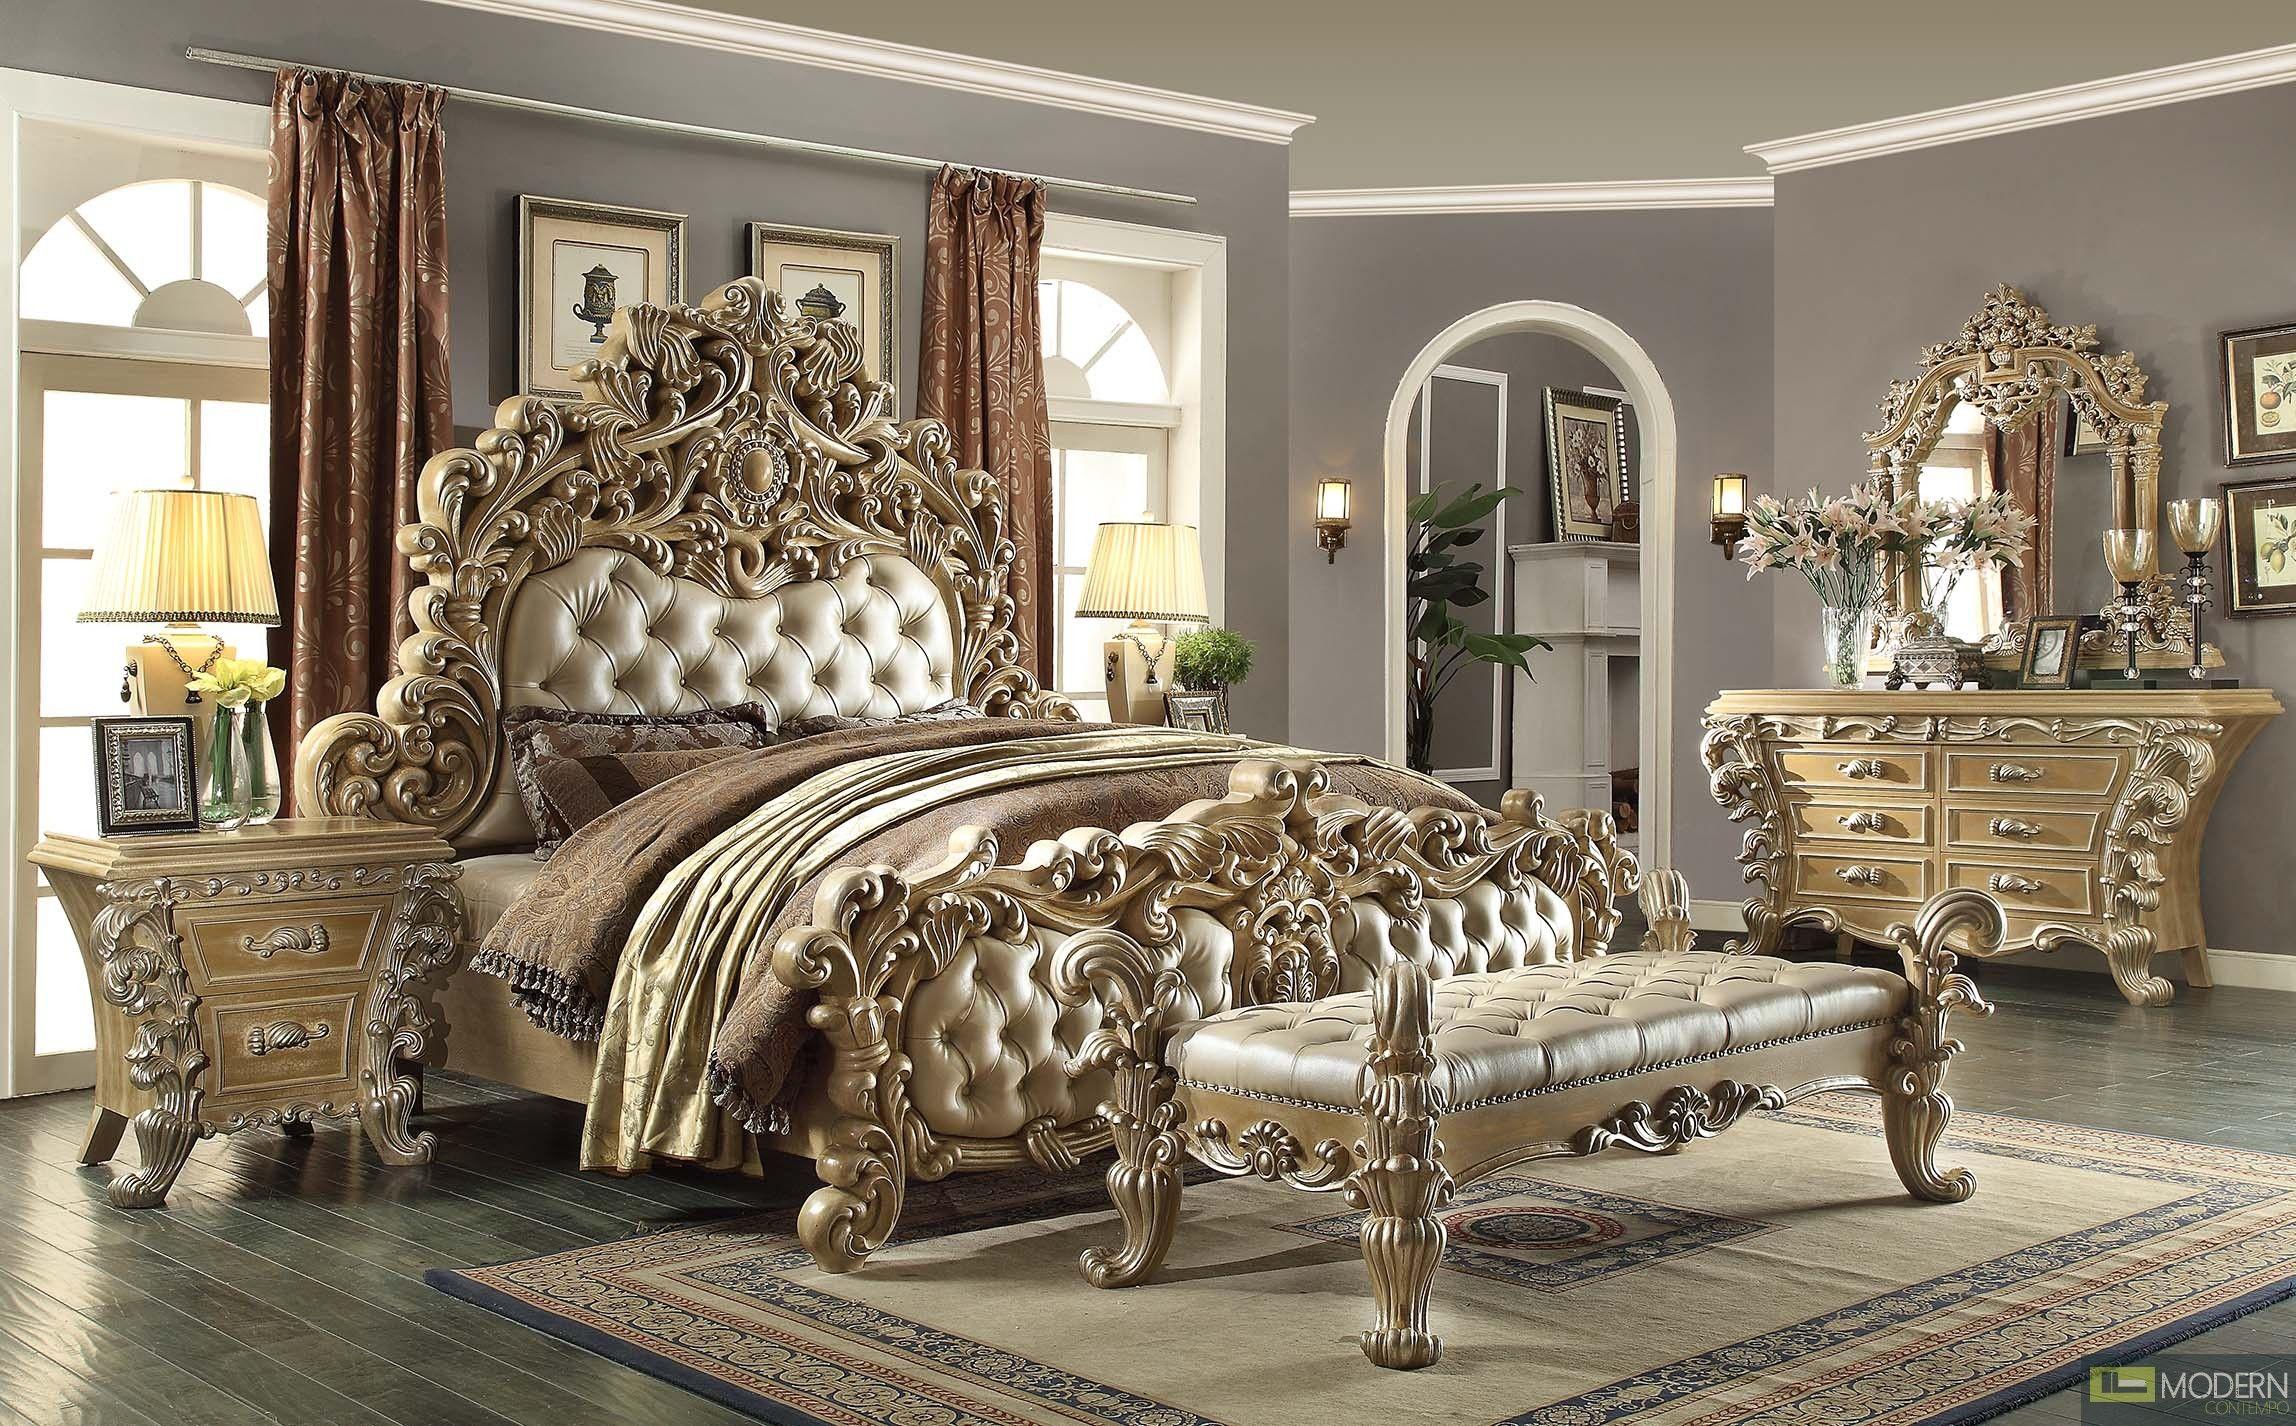 Cleopatra European Style Luxury King Bed Luxury Bedroom Sets